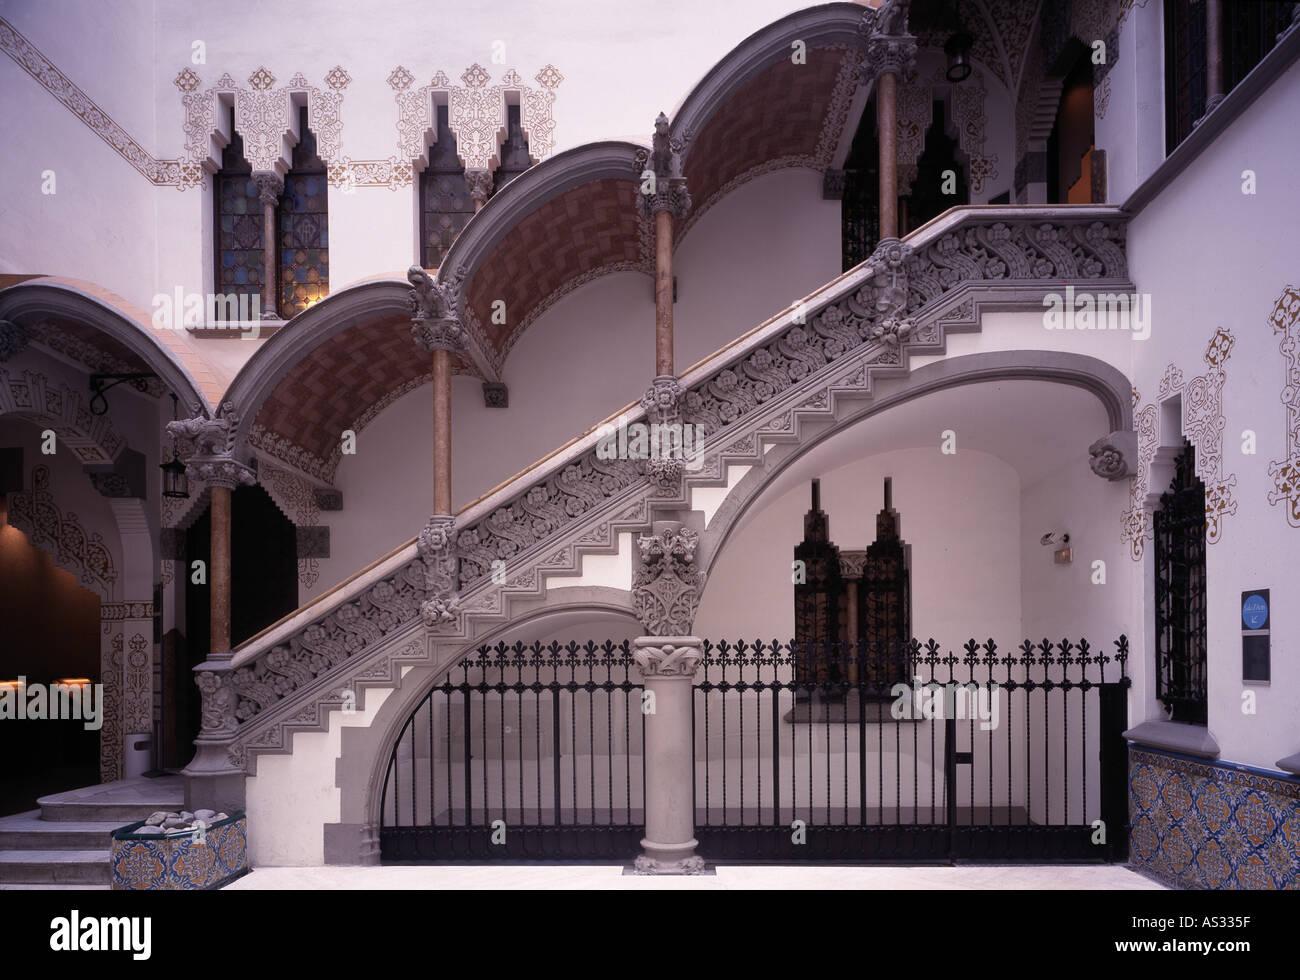 Barcelona,  Casa Macaya, Architekt: Josep Puig i Cadafalch 1901 - Stock Image